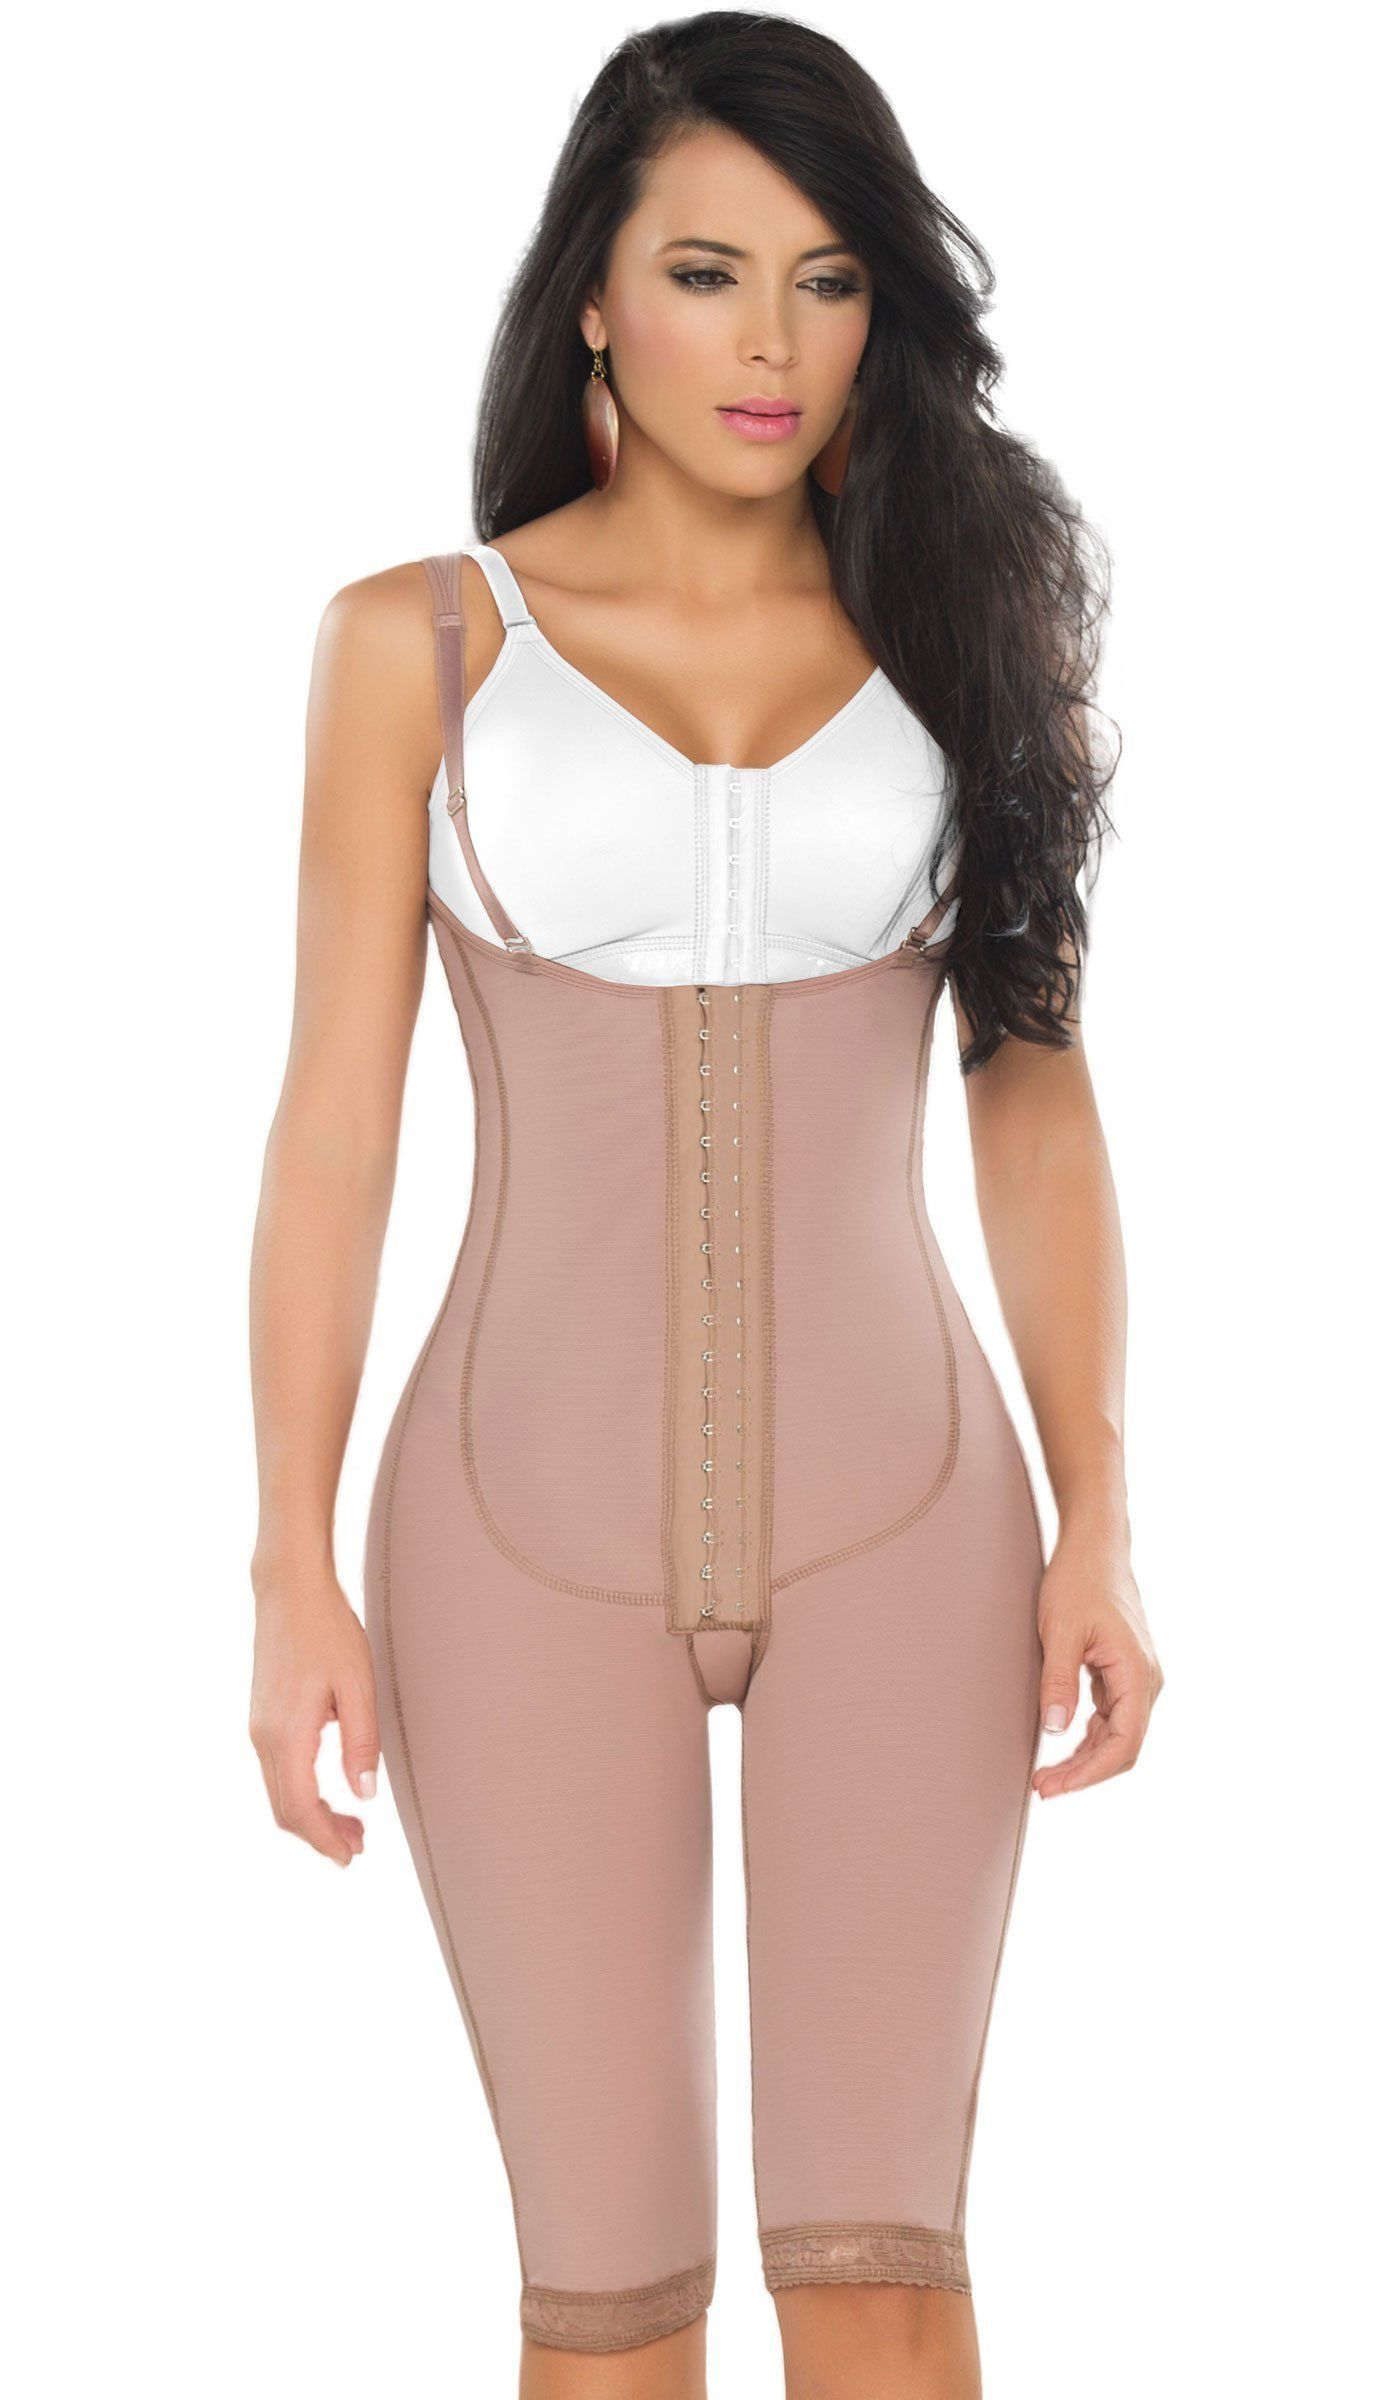 39a3d011c38 Fajas DPrada 11175 Braless Shapewear Post Surgery Compression Garment Girdle  - Cocoa-Optic - 3XL